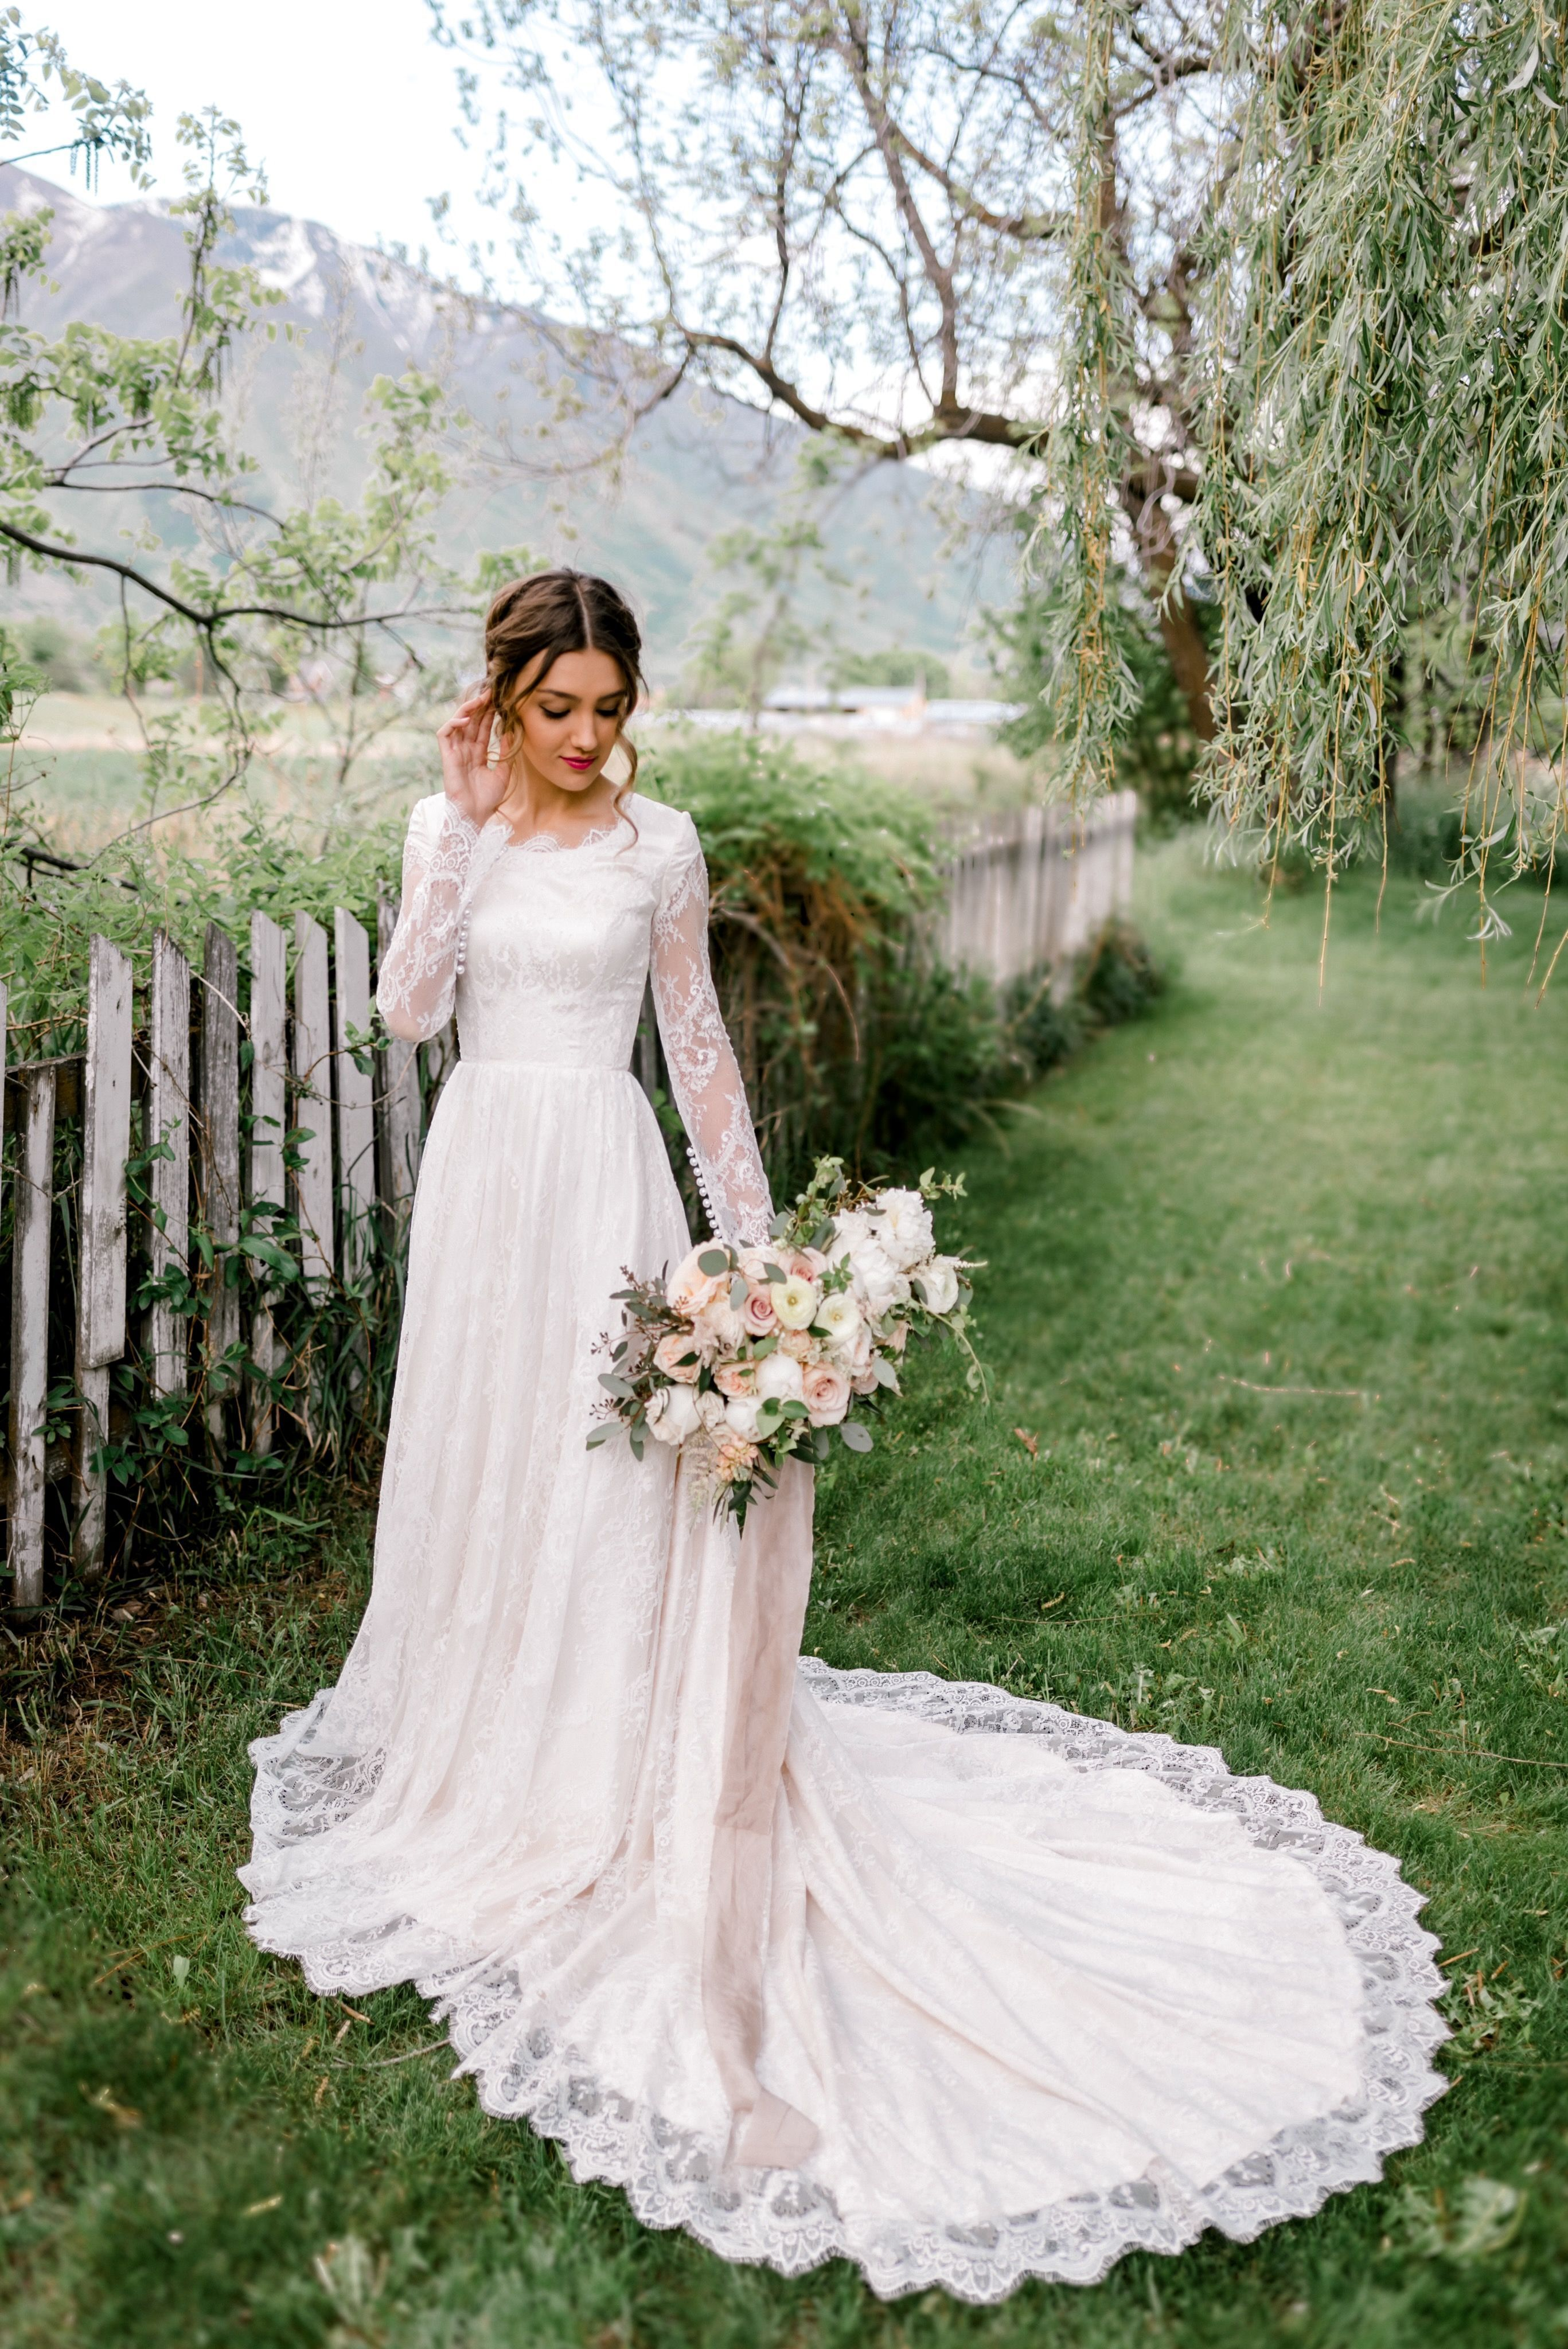 Fashion Long Sleeve Wedding Dress Couples Matching Outfits For Wedding Gri In 2020 Long Sleeve Wedding Dress Lace Lace Wedding Dress With Sleeves Aline Wedding Dress [ 4096 x 2734 Pixel ]